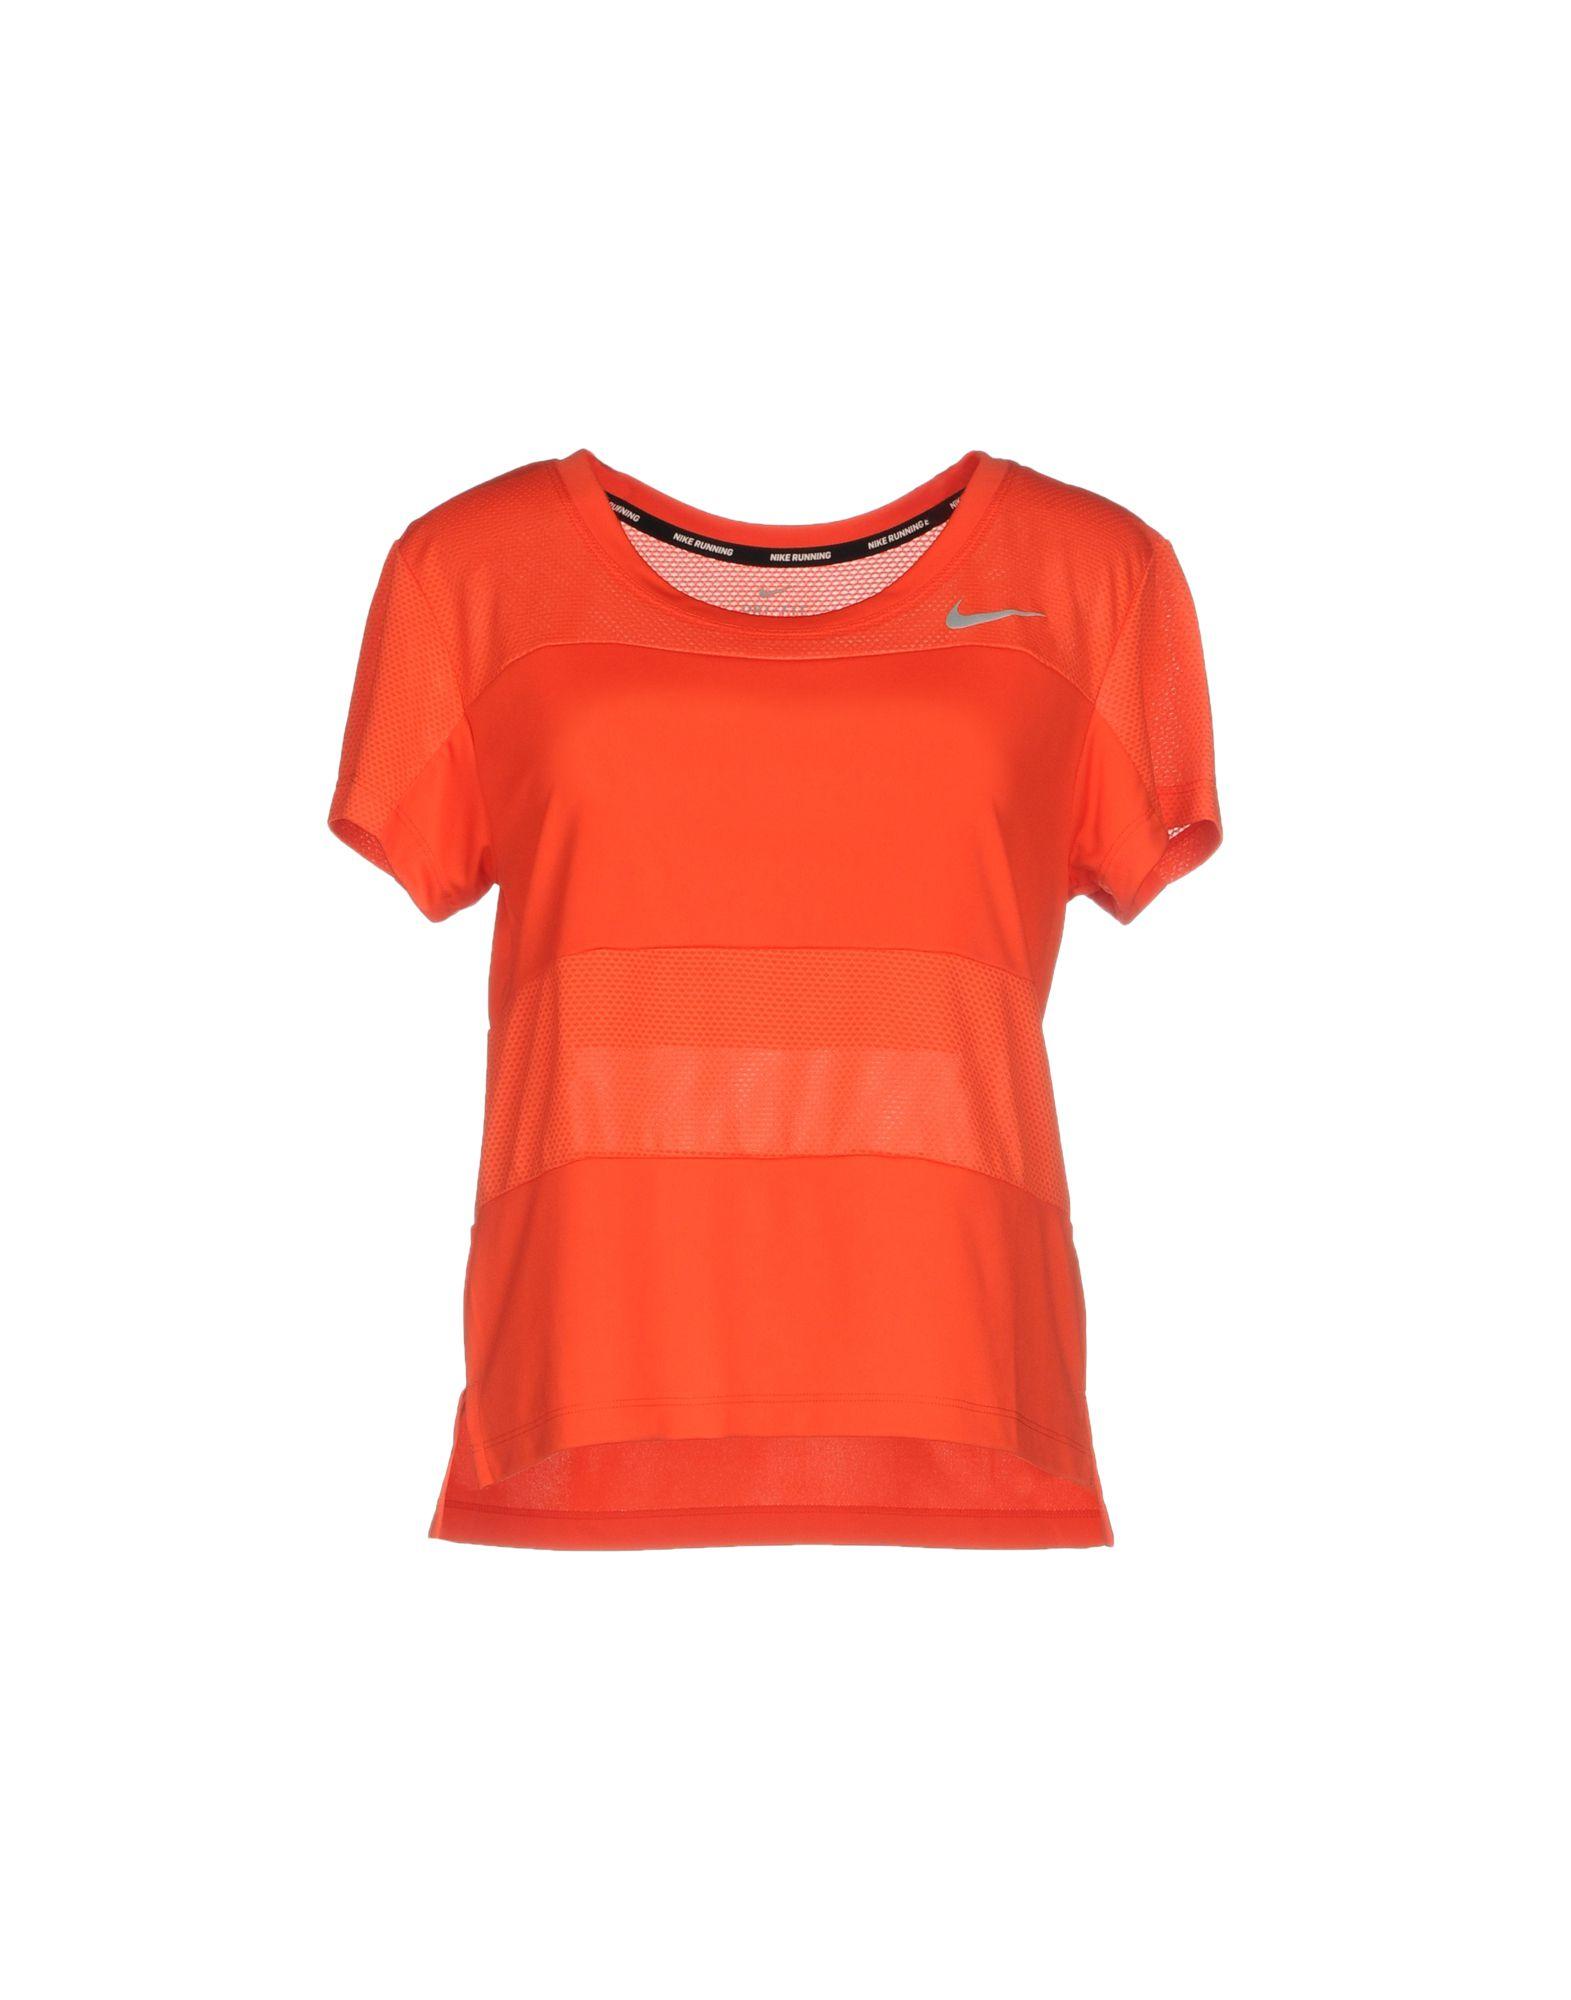 Bra E Top Performance Nike Nike Nike  Dry Top Short Sleeves City Core - donna - 12037607ES 3ae